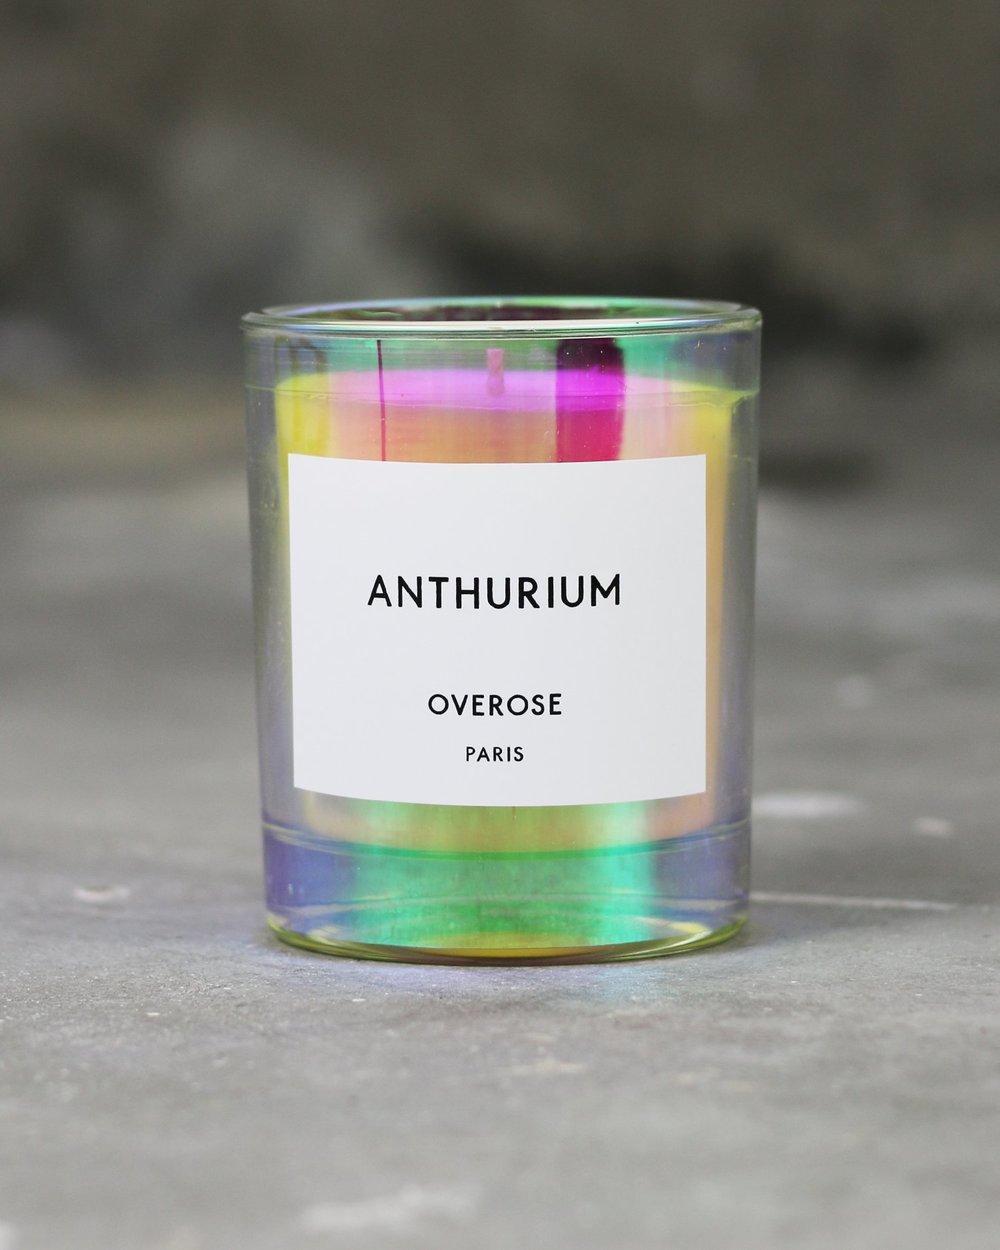 Overose_Anthurium_Holo_Candle_1050x@2x.progressive.jpg